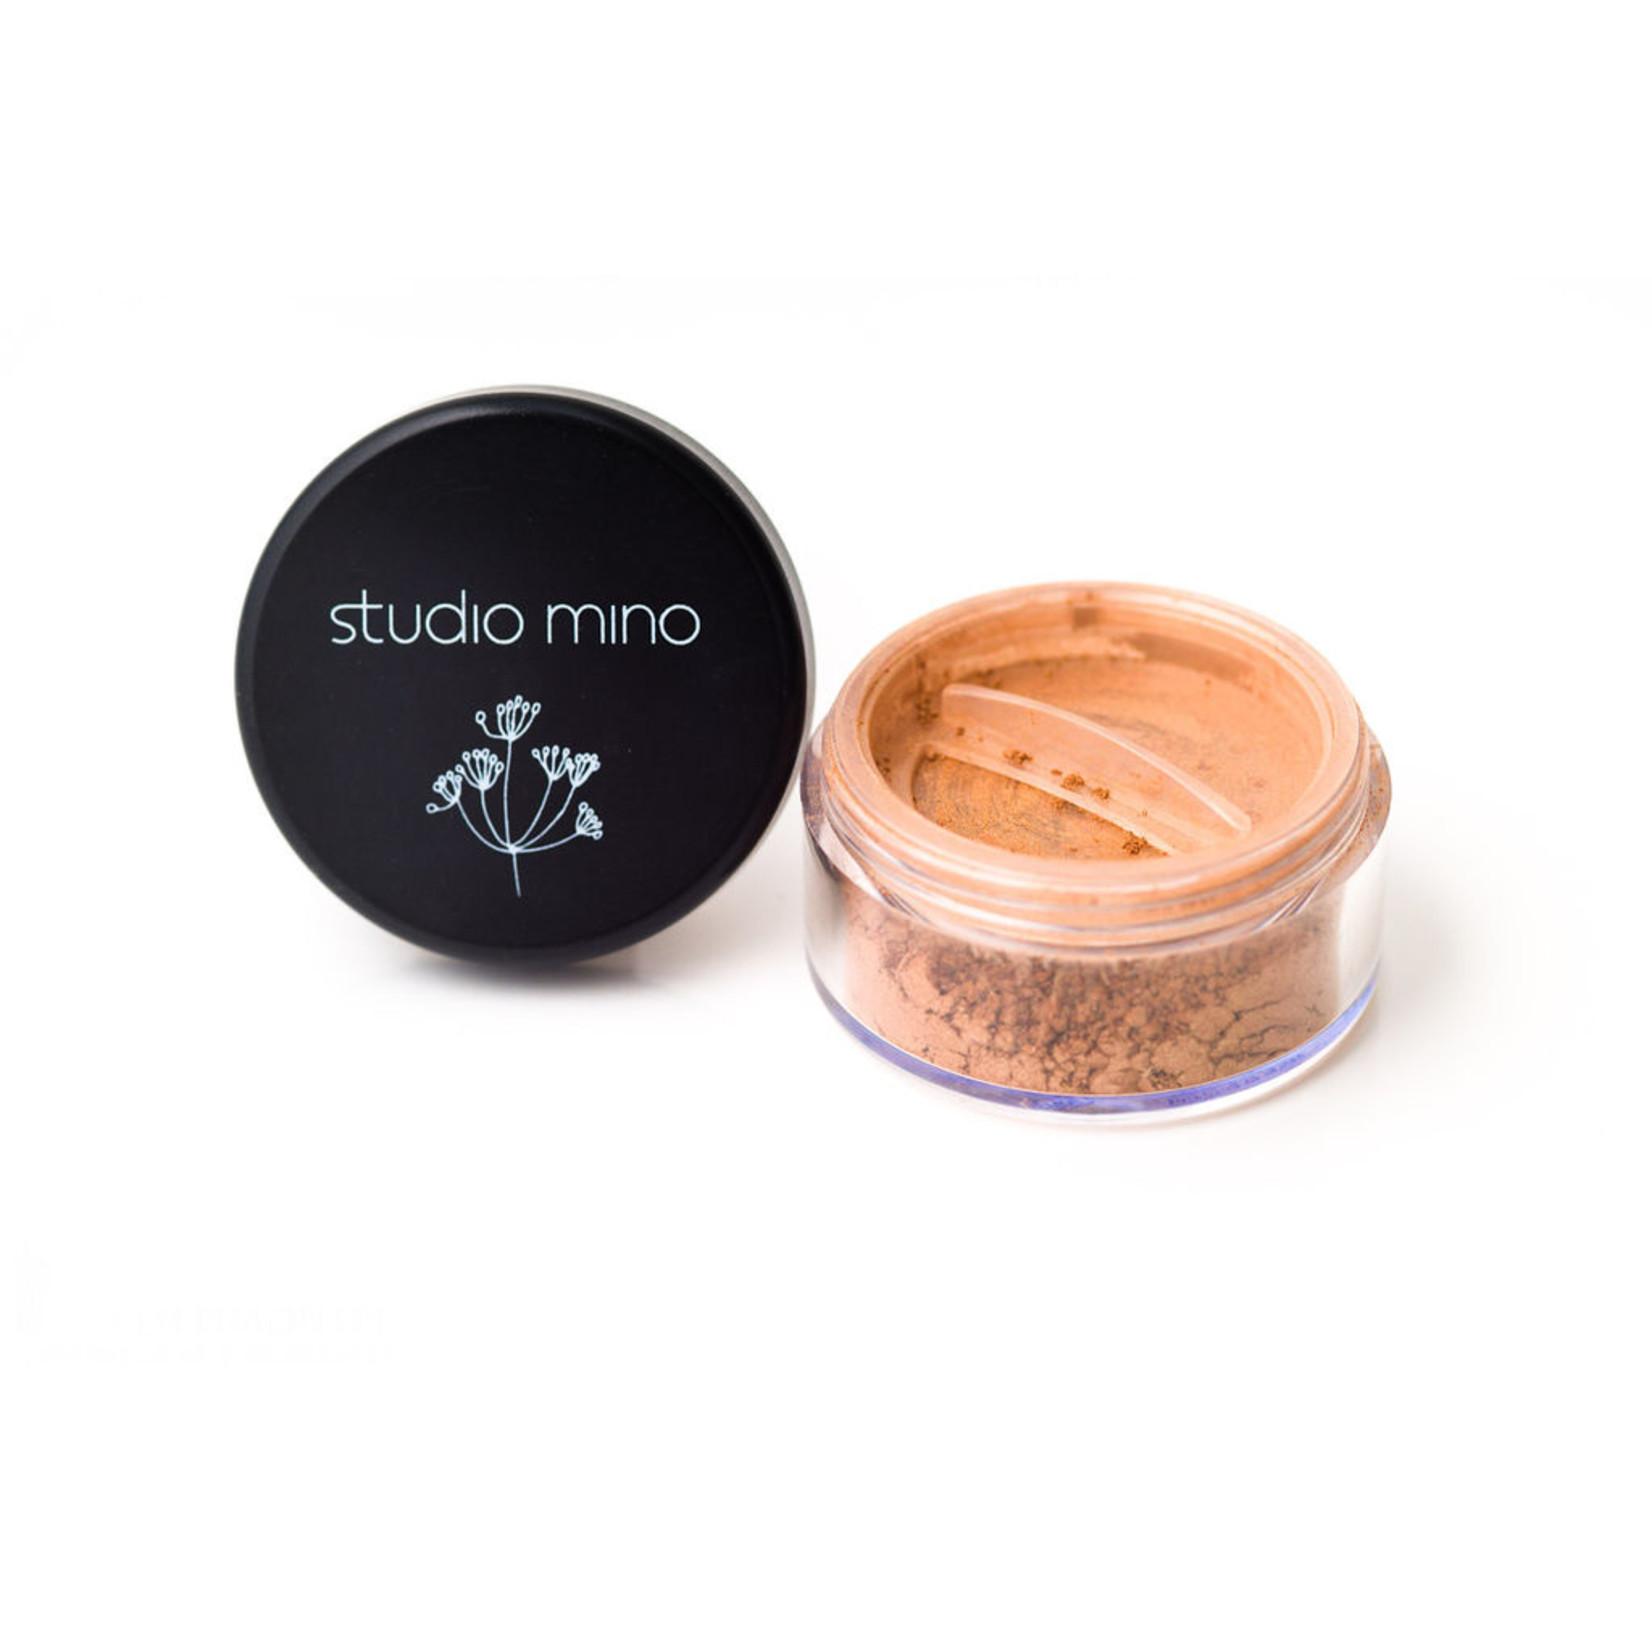 Studio mino Minerale Bronzer Medium dark